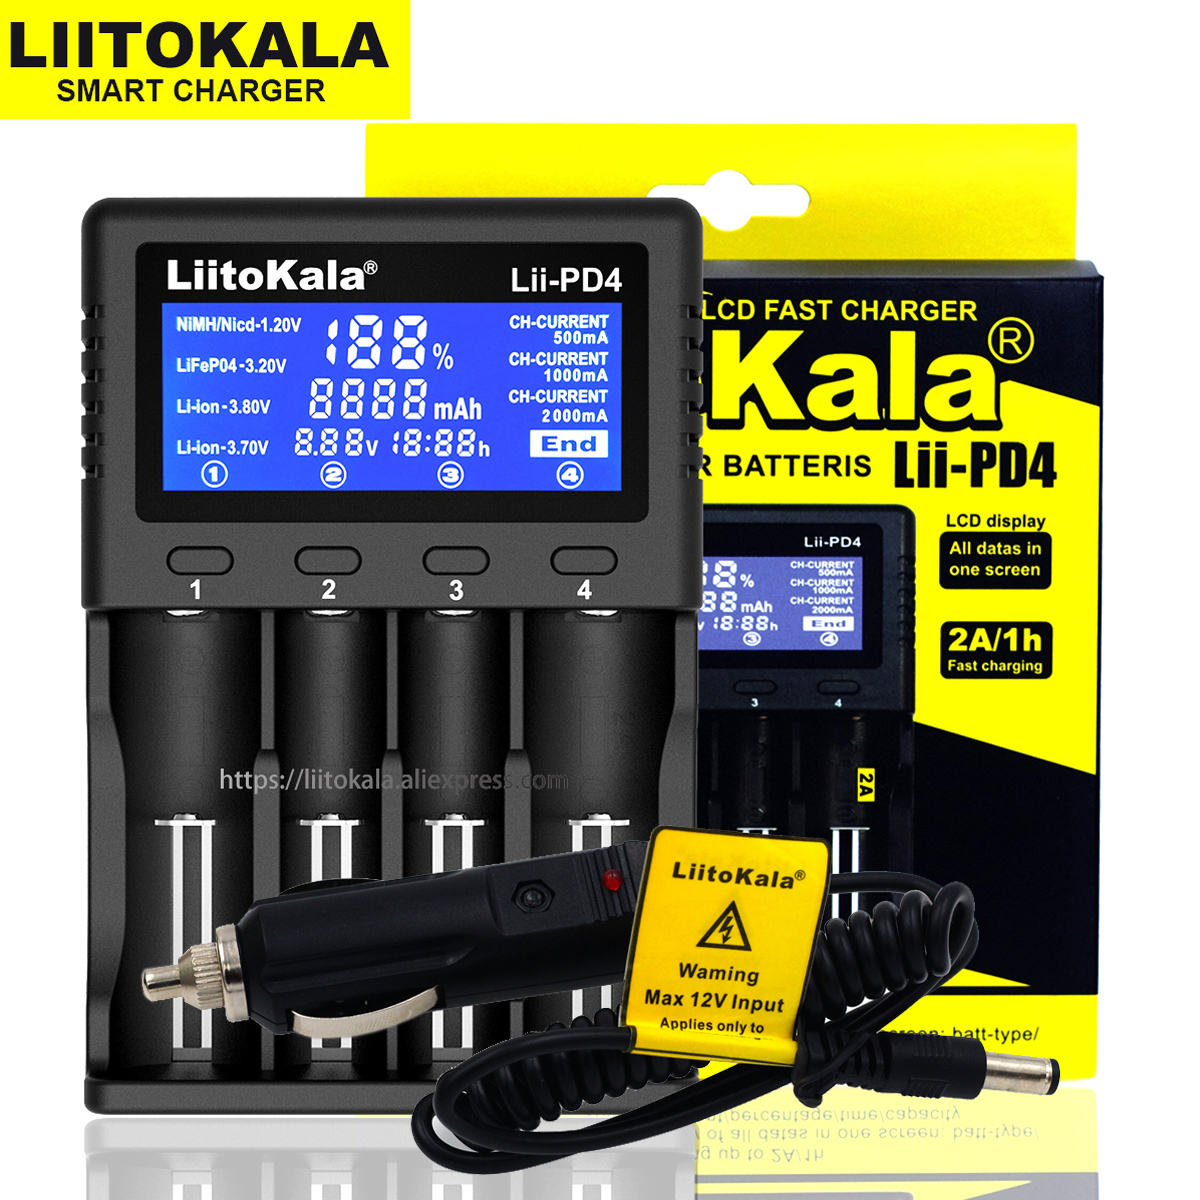 Liitokala Lii-500 Lii-PD4 Lii-S6 Lii-500S 18650 21700 26650 AA AAA For 18350 18500 16340 17500 25500 10440 17350 Battery Charger